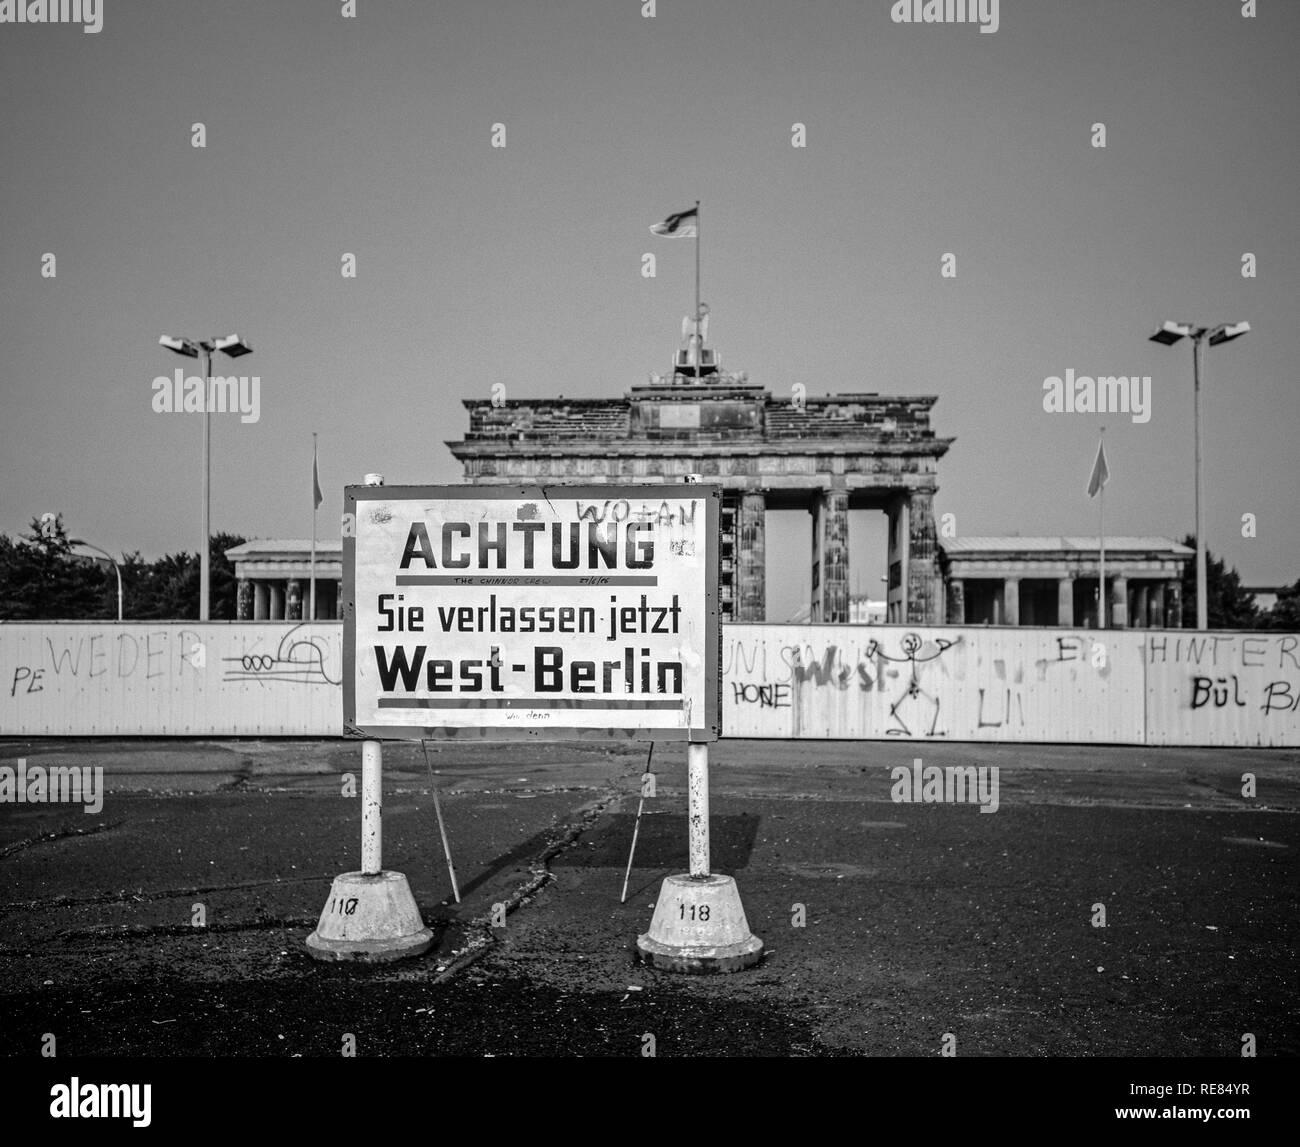 August 1986, leaving West Berlin warning sign in front of the Berlin Wall, Brandenburg Gate in East Berlin, West Berlin side, Germany, Europe, - Stock Image